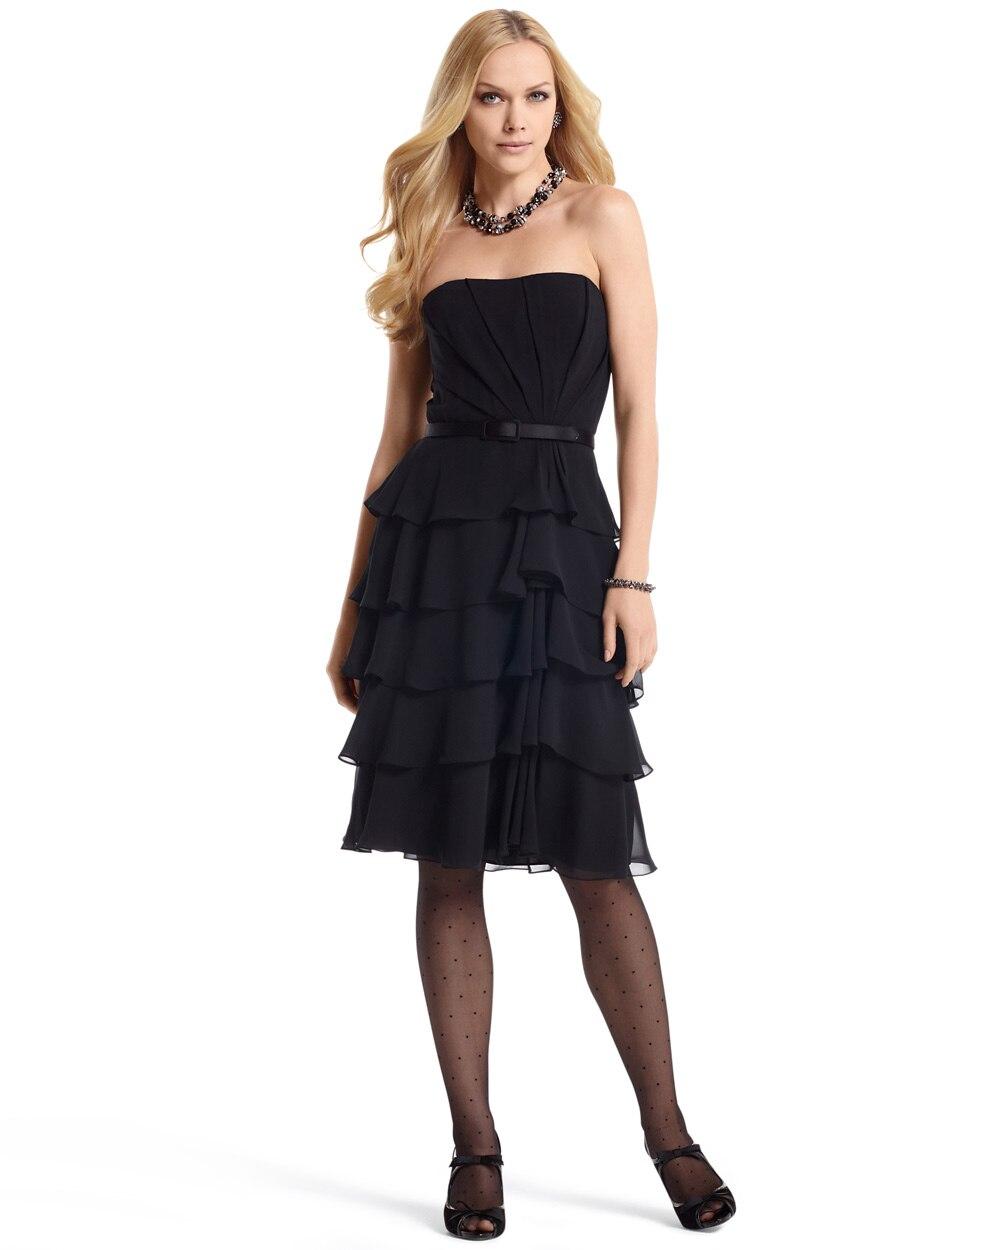 Ruffled Chiffon Dress White House Black Market